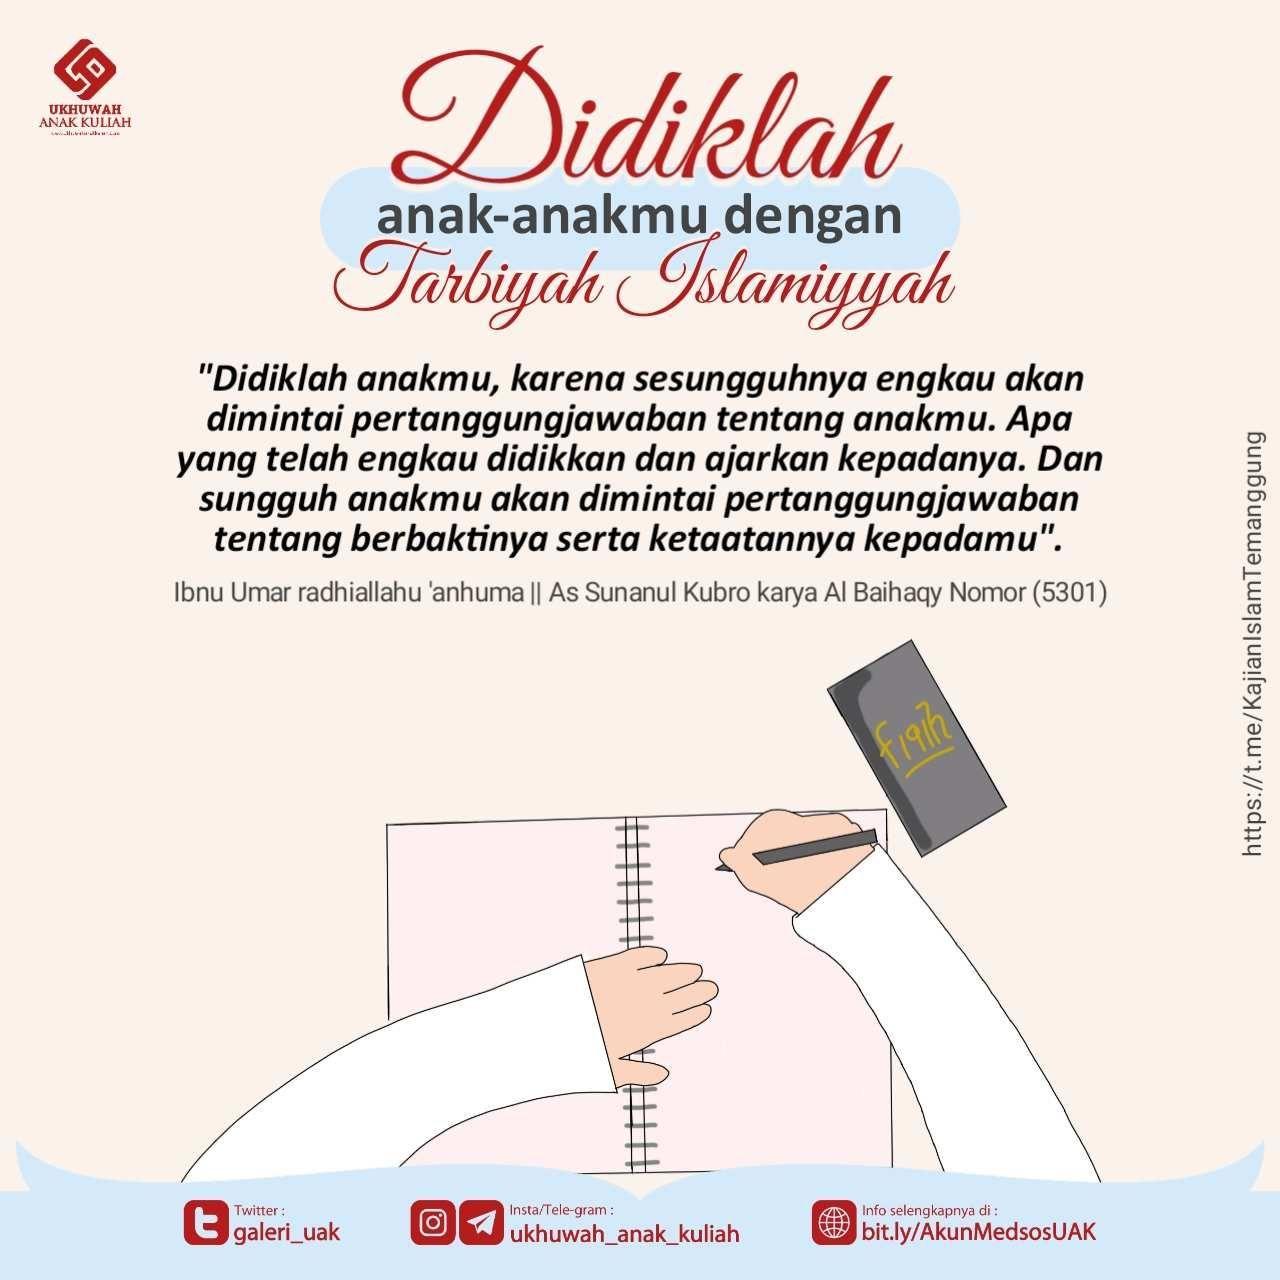 Didiklah anak anakmu dengan tarbiyah islamiyyah